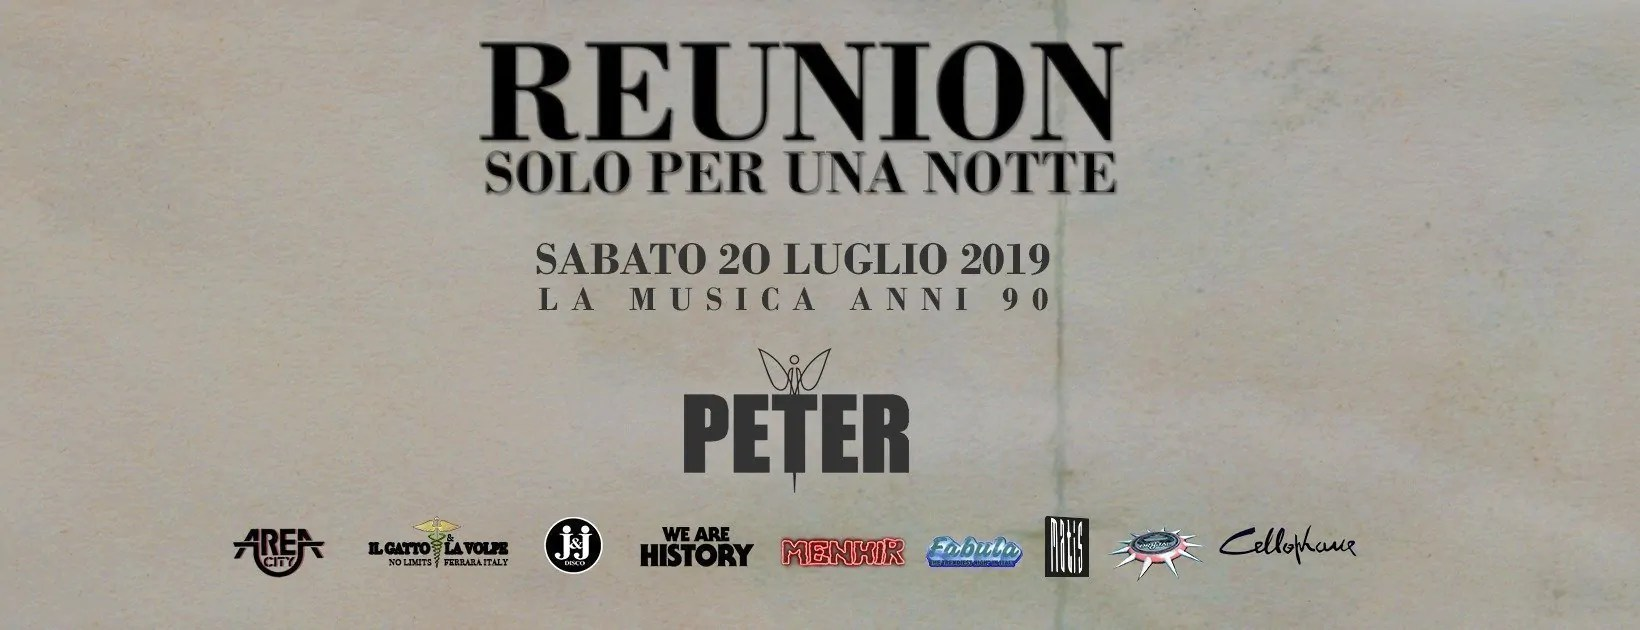 Peter Pan Riccione Reunion